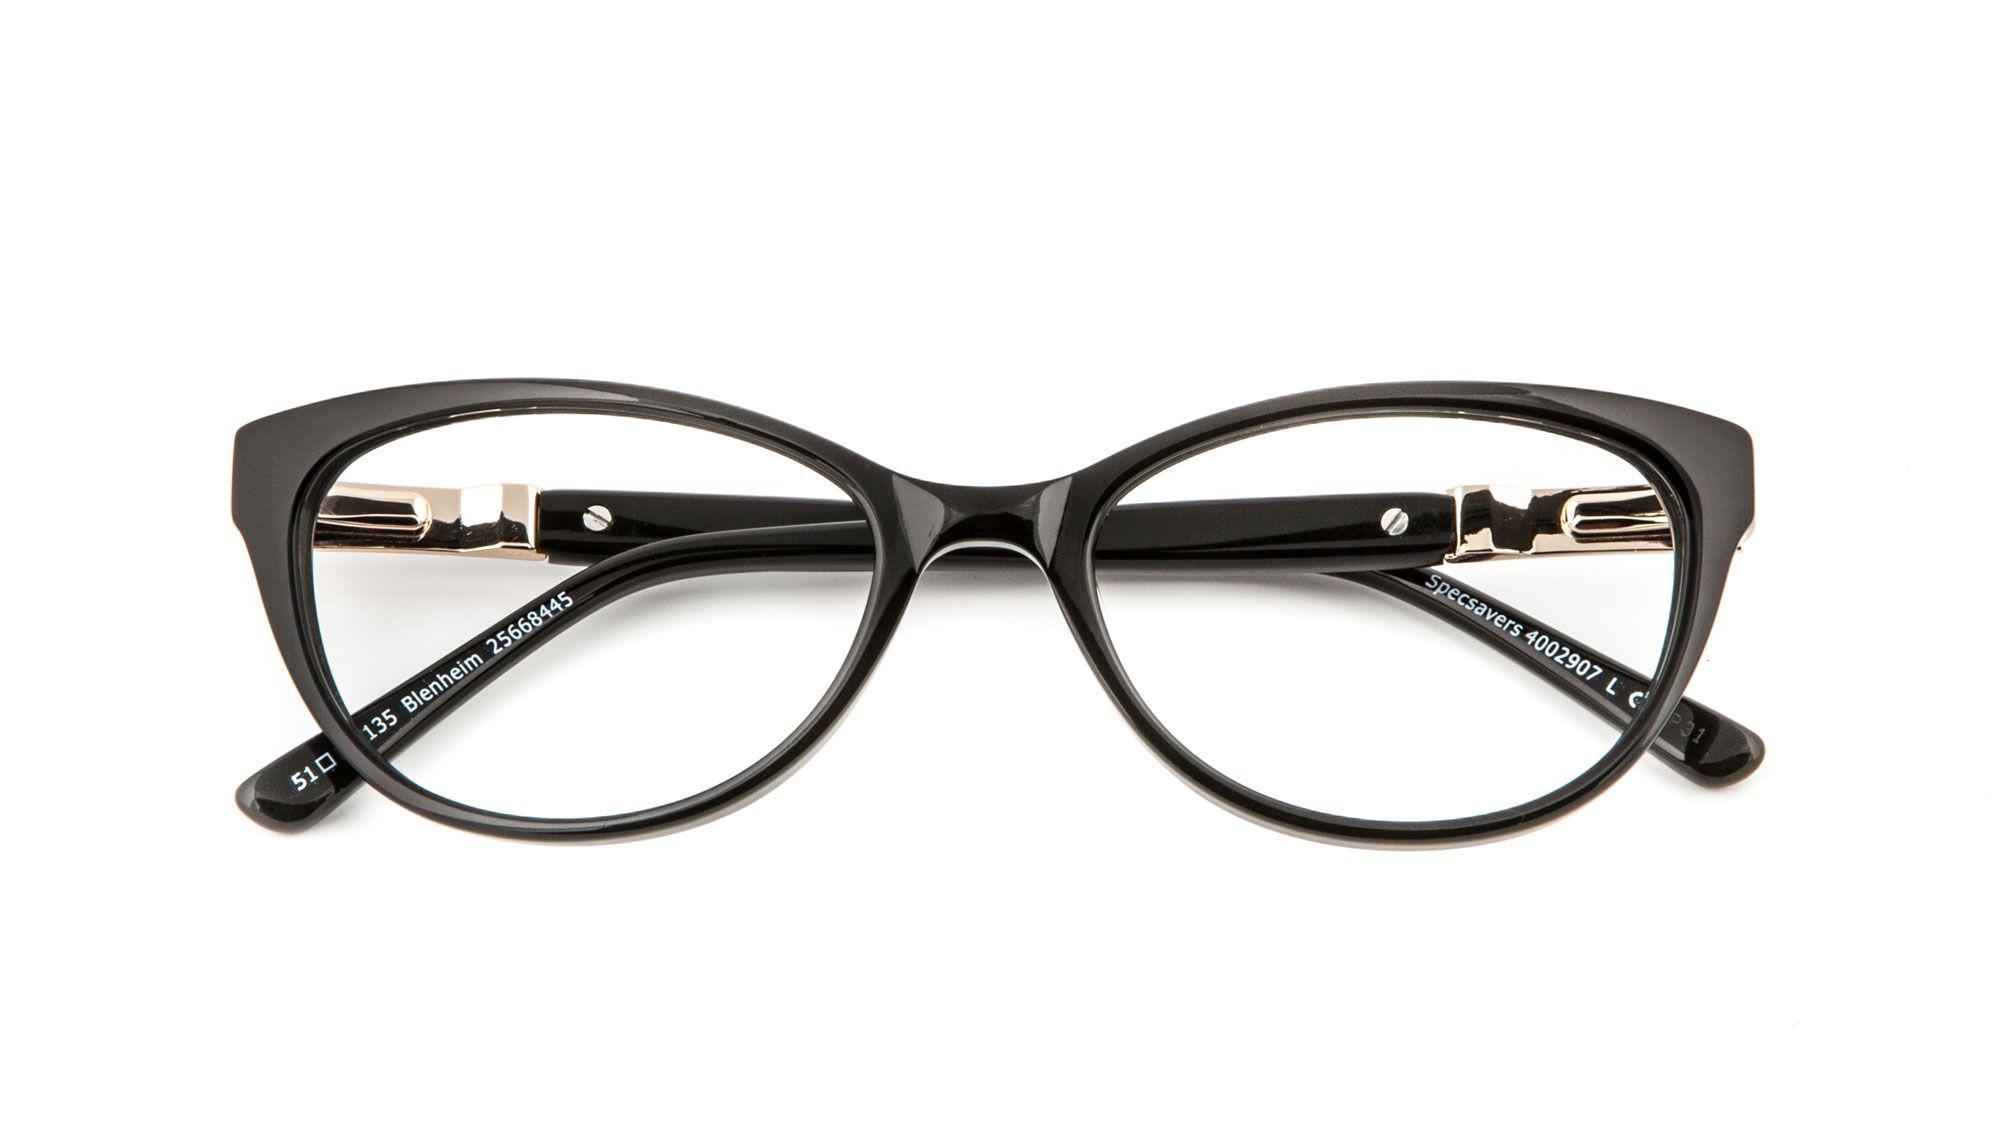 8fc3ae4c5353 Specsavers glasses - BLENHEIM